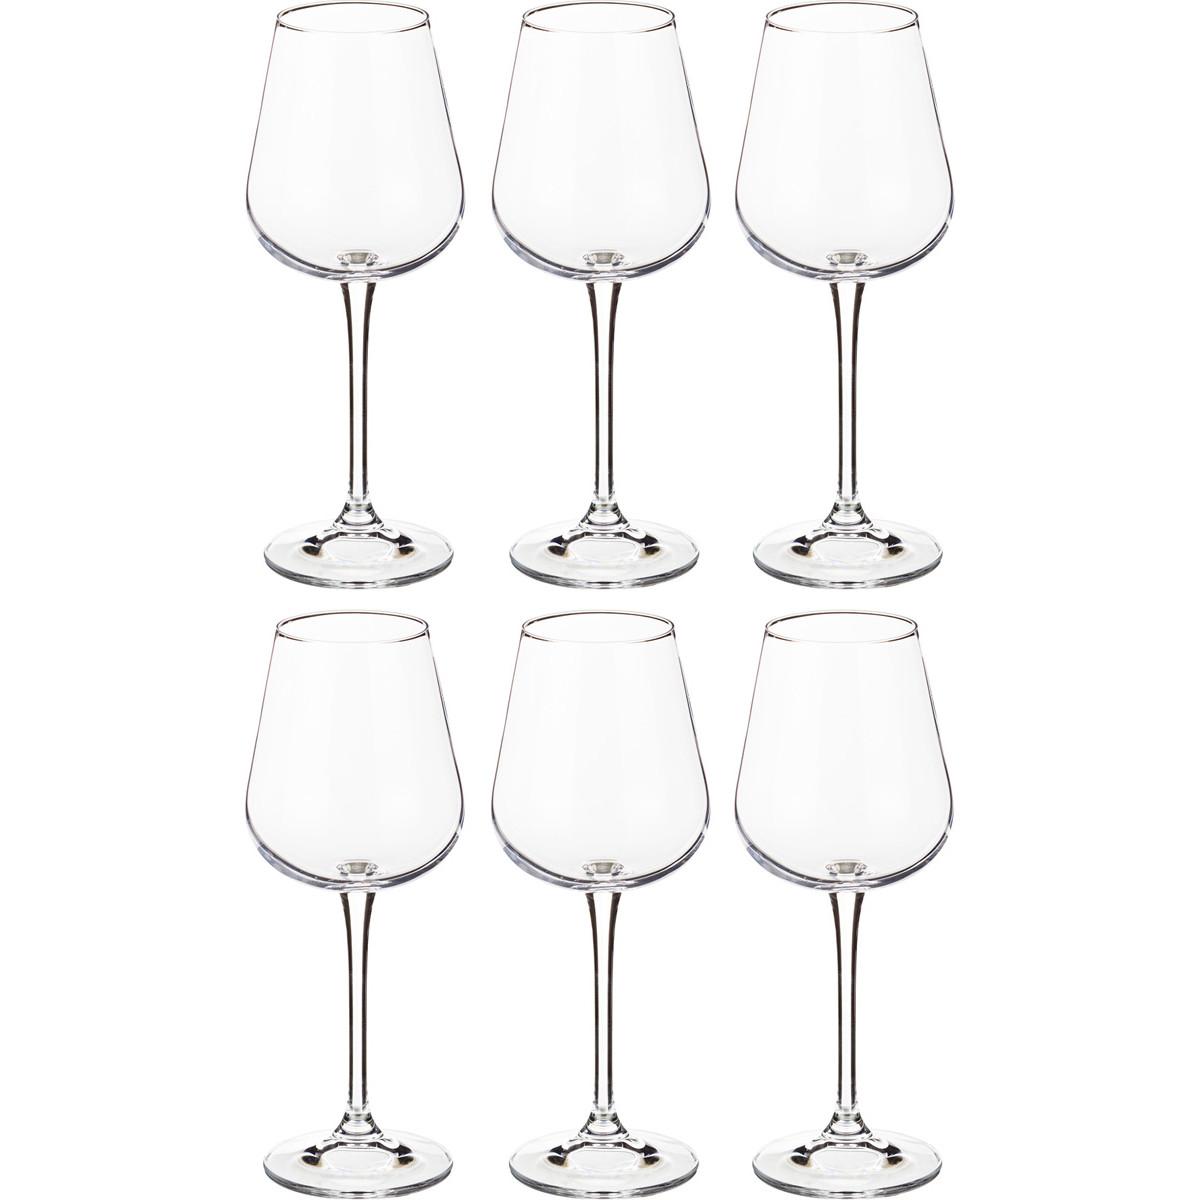 {} Crystalite Bohemia Набор бокалов для вина Storm (22 см - 6 шт) набор бокалов для бренди 6 шт crystalite bohemia набор бокалов для бренди 6 шт